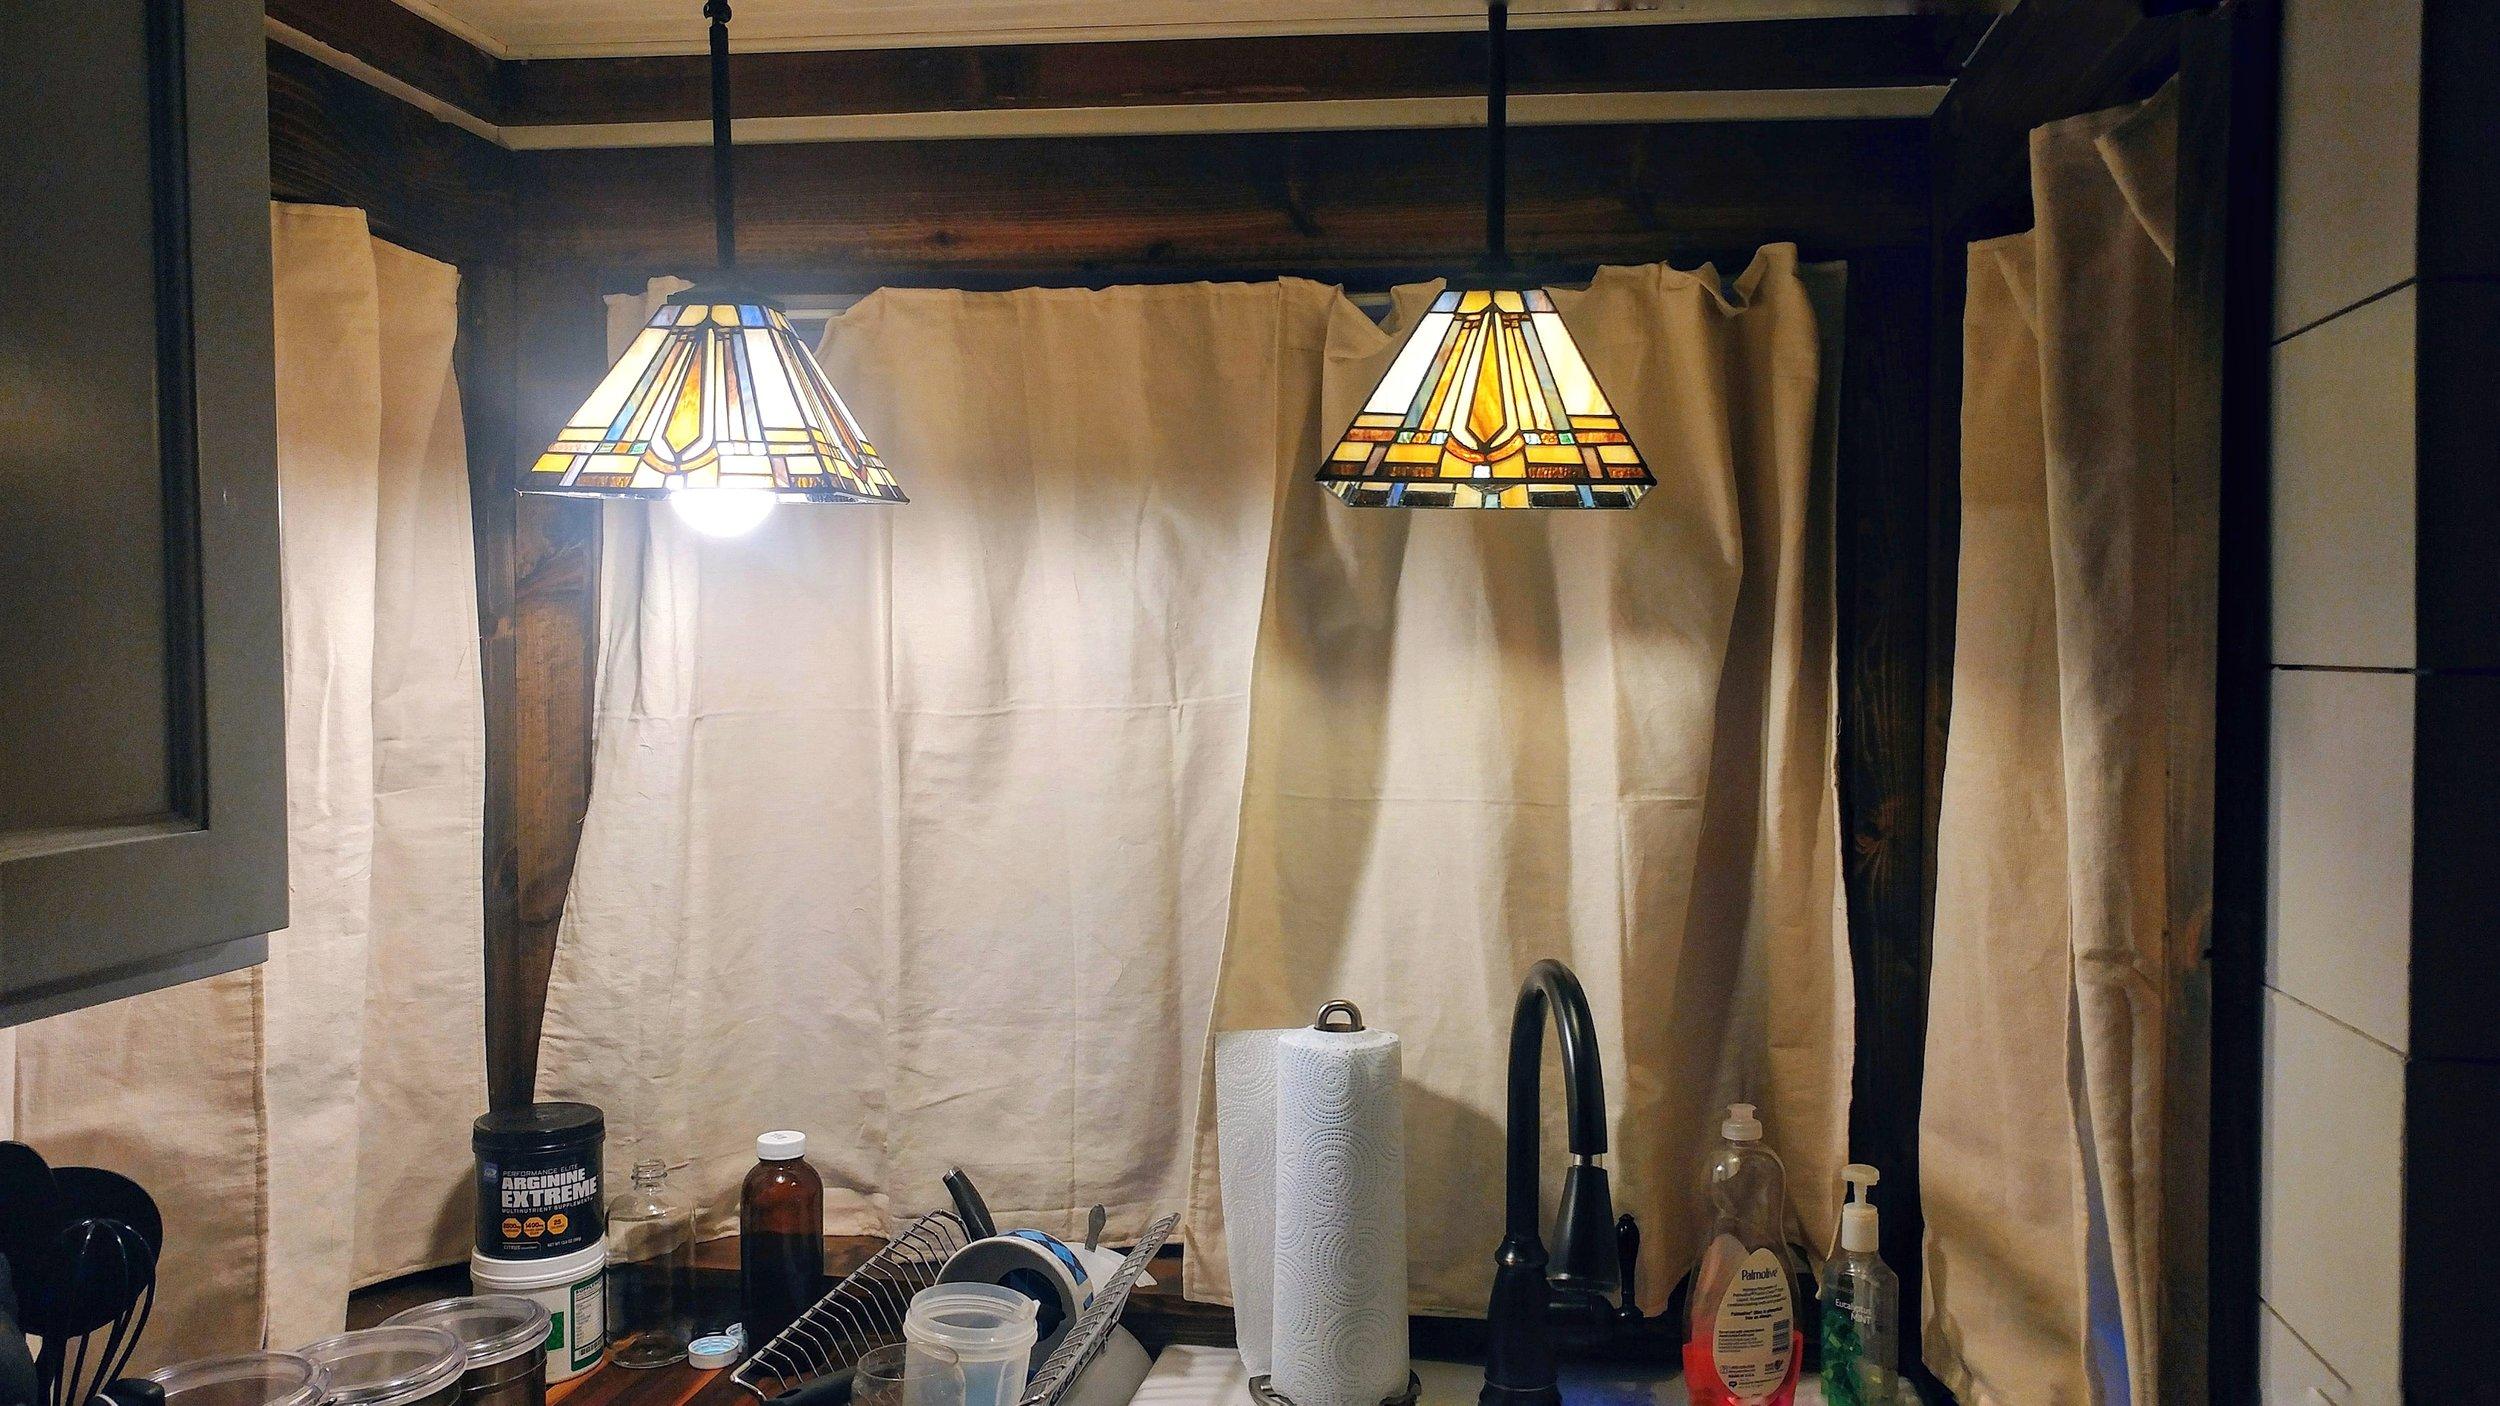 Tiny home Lighting LED bulb size lighting techniques kichen